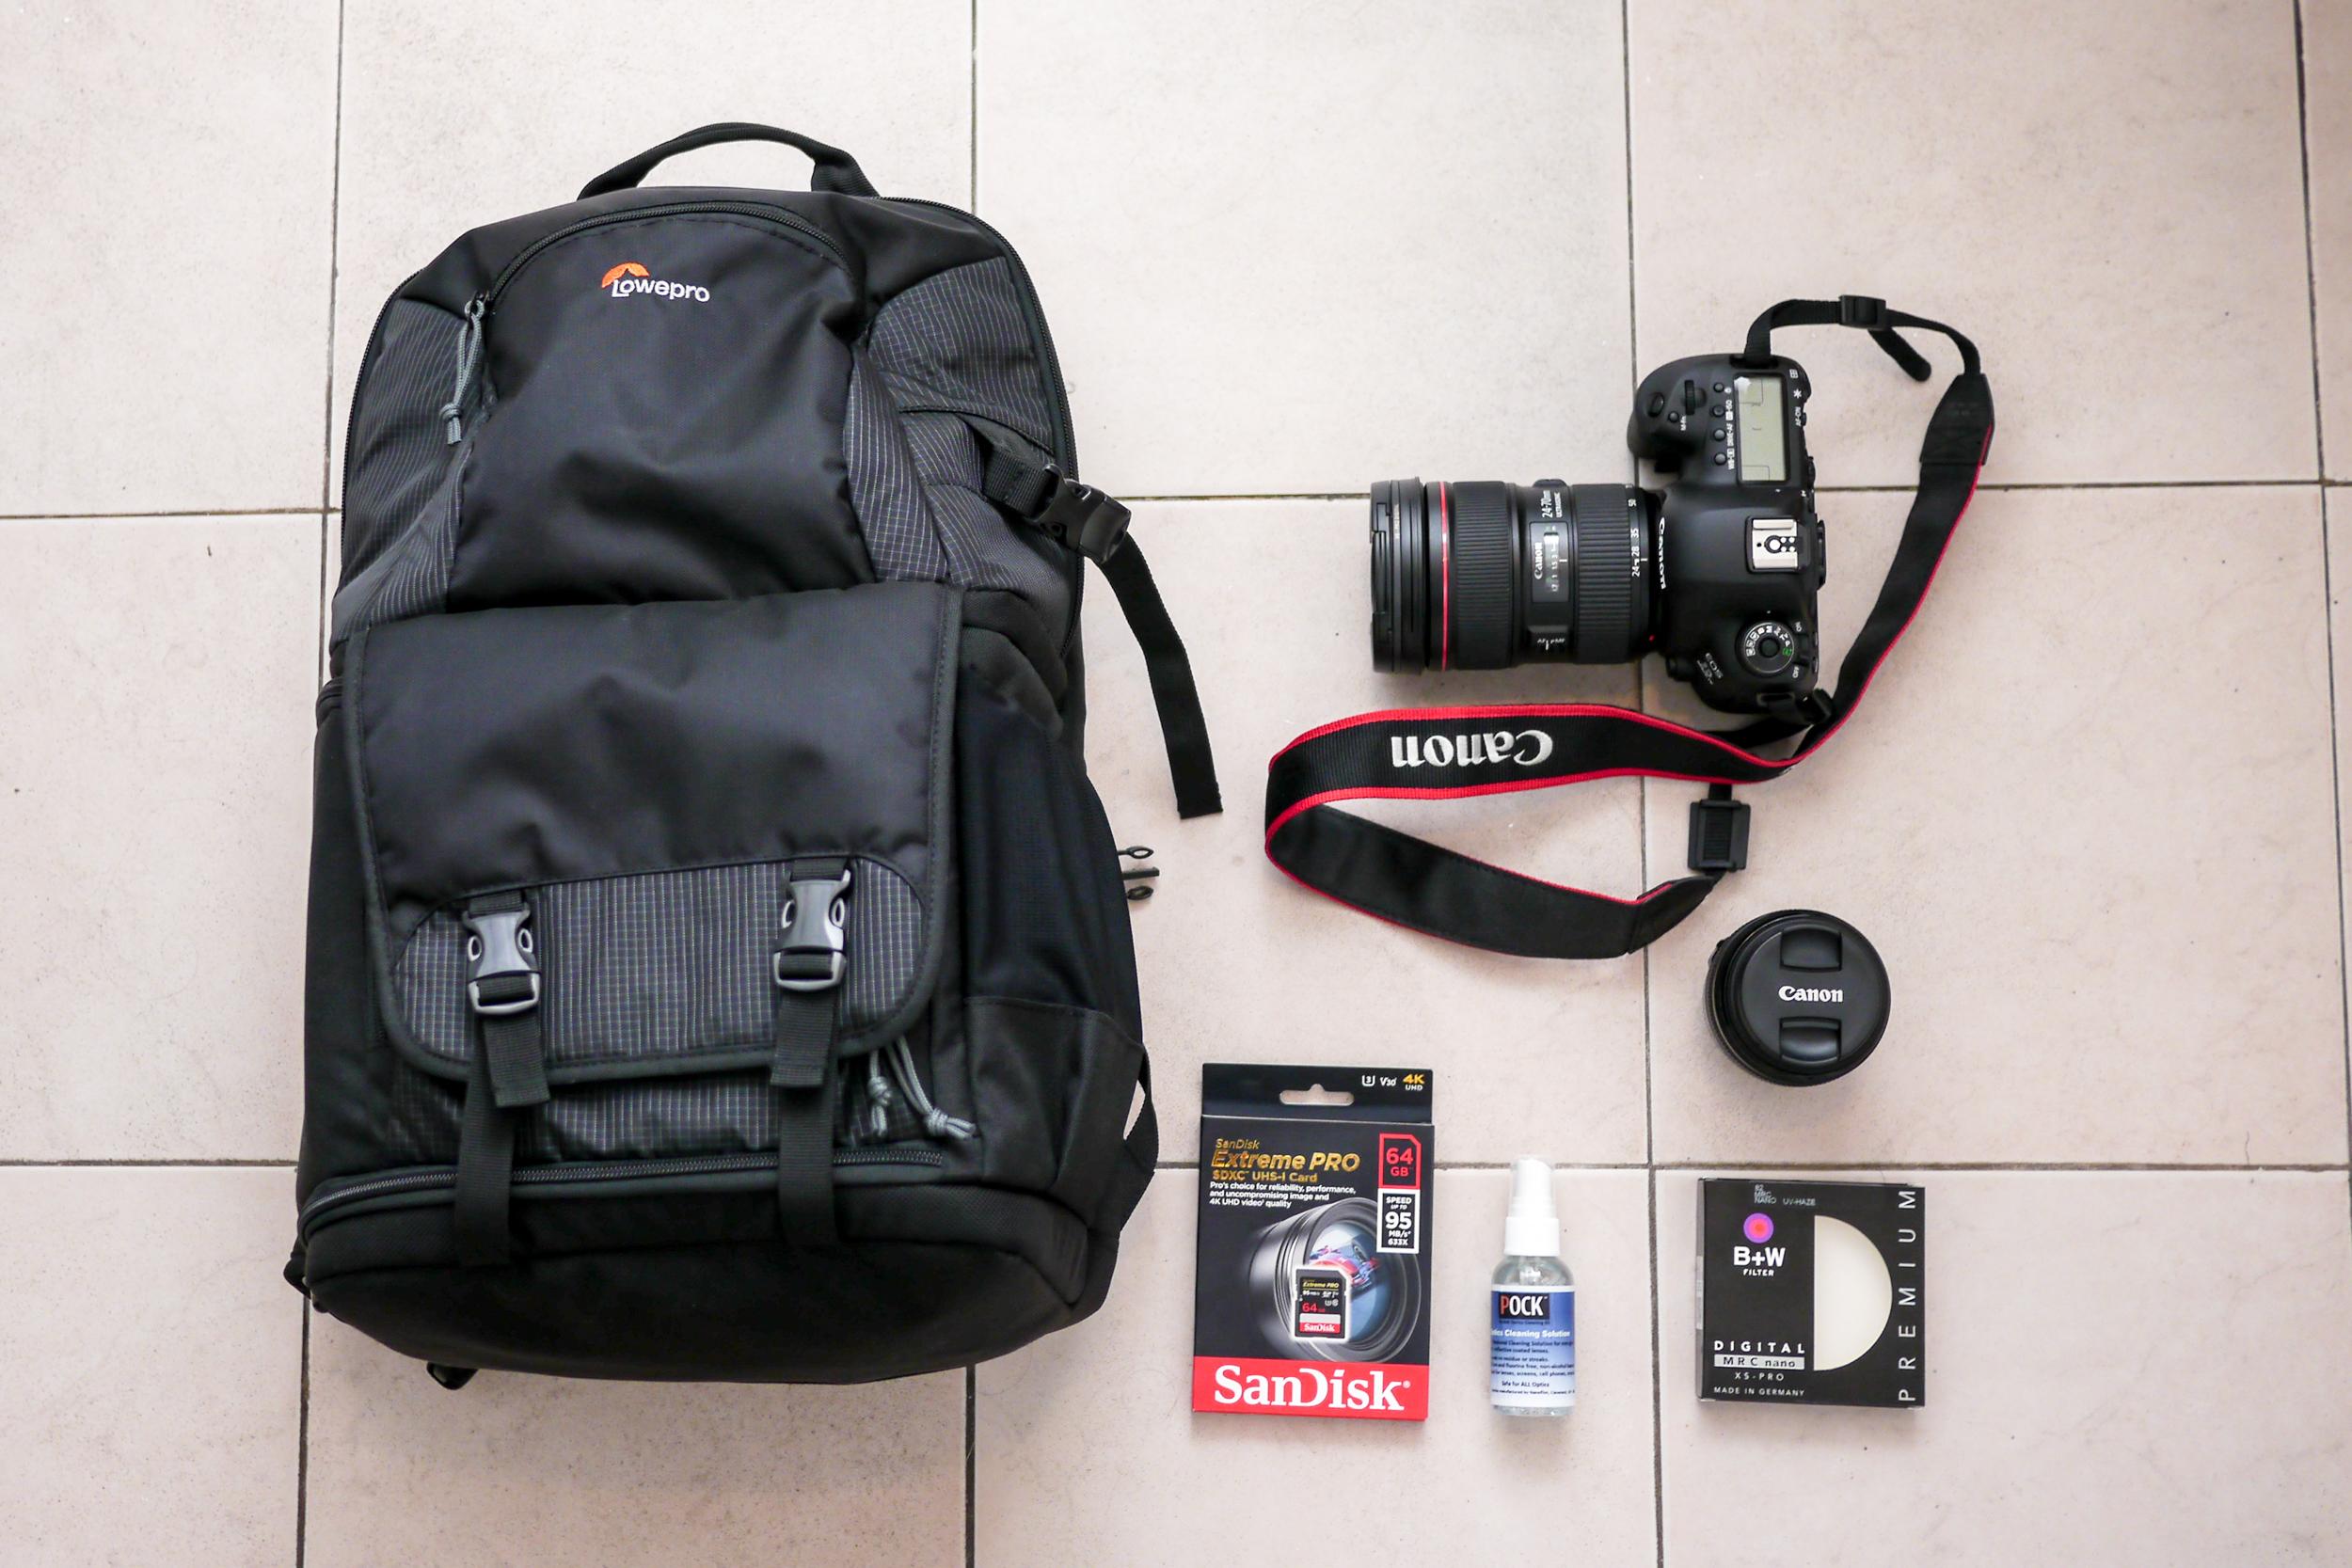 Bag, Lowepro    ;    Camera, Canon    ;    Lens, Canon    ;    UV Filters, Schneider